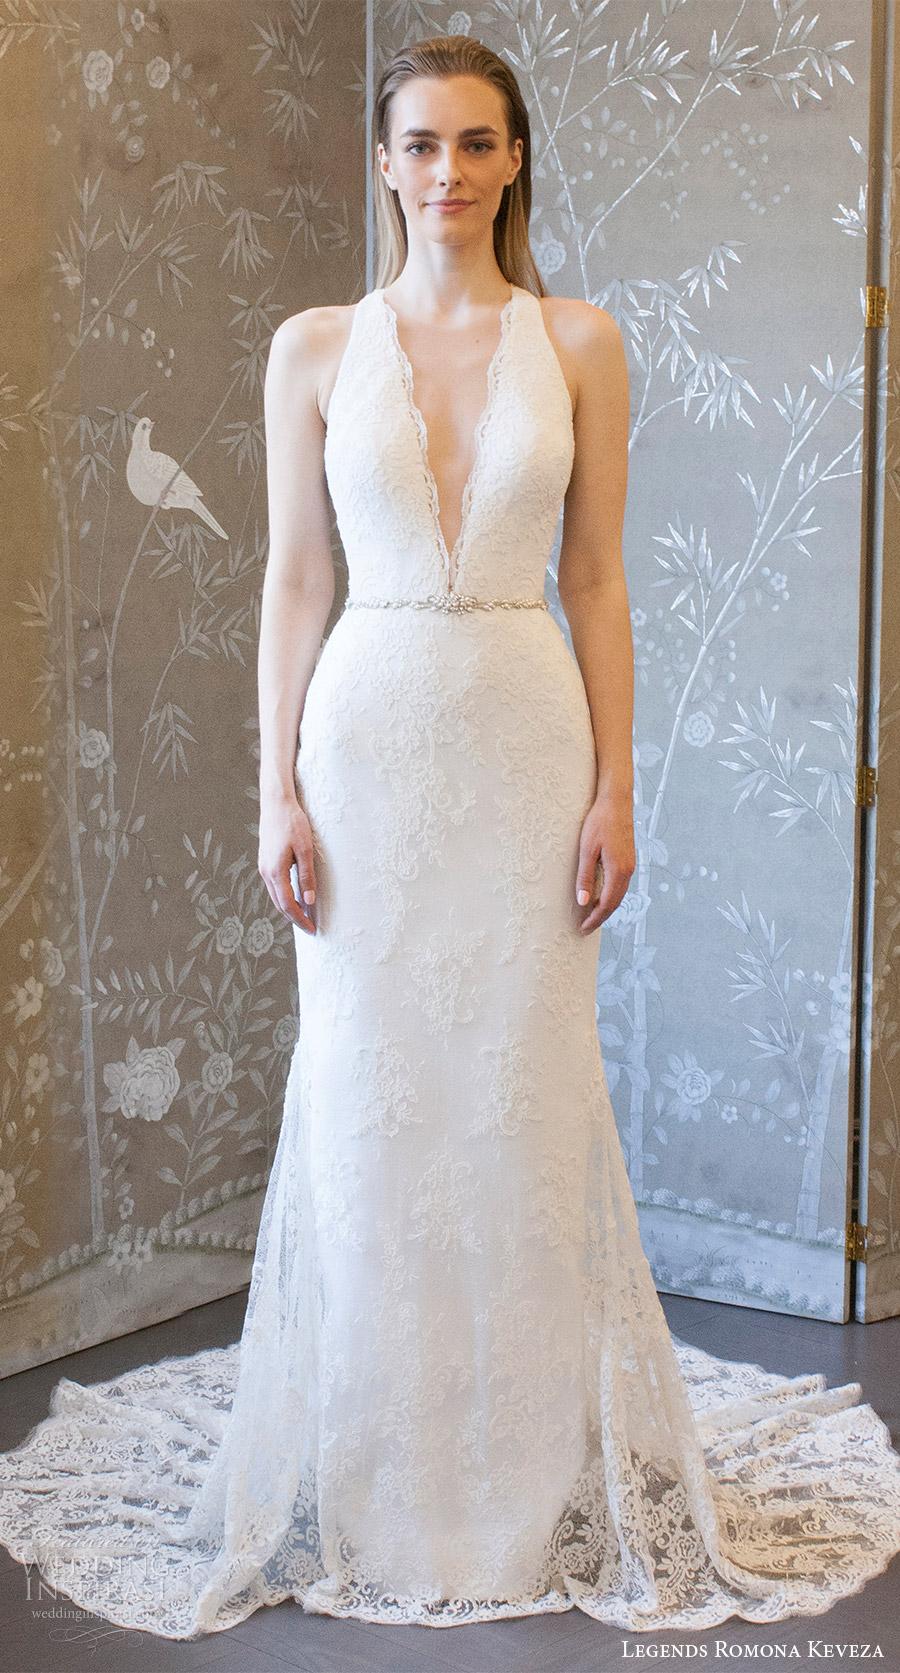 legends romona keveza spring 2018 bridal sleeveless deep v neck lace sheath wedding dress (l8127) mv elegant romantic long train